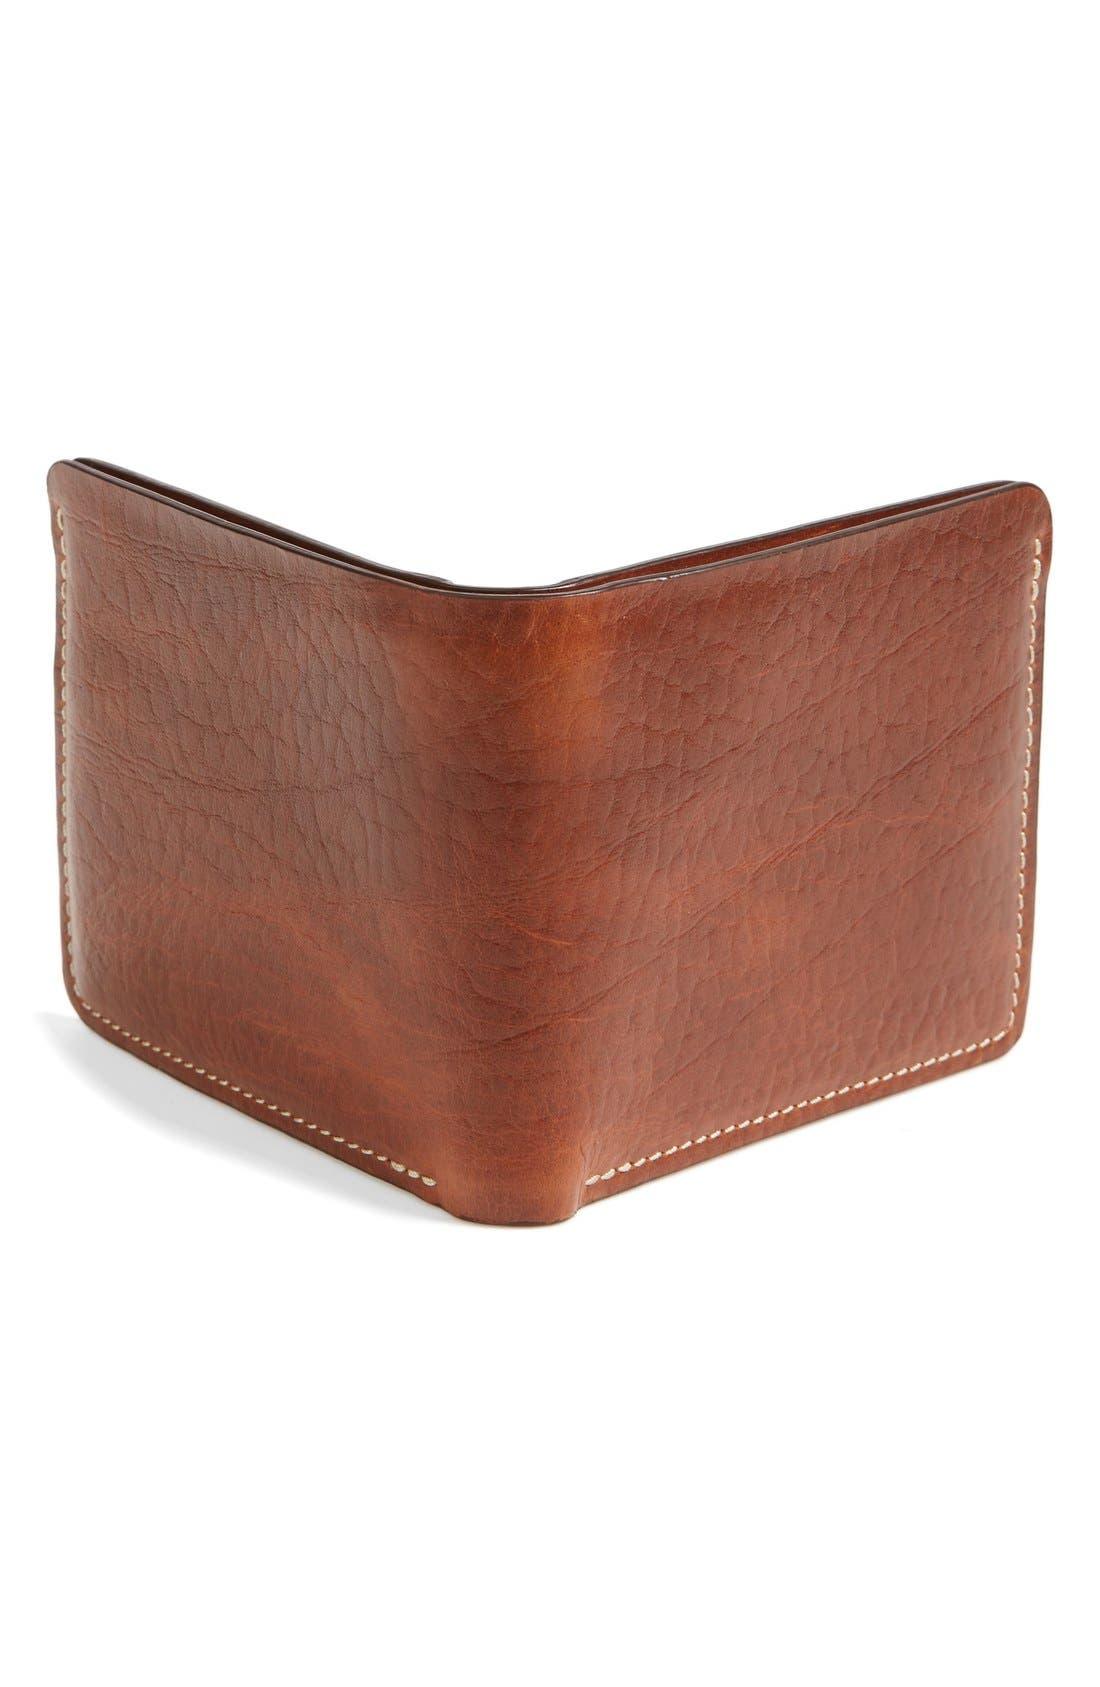 'Jackson' Bison Leather Wallet,                             Alternate thumbnail 3, color,                             700